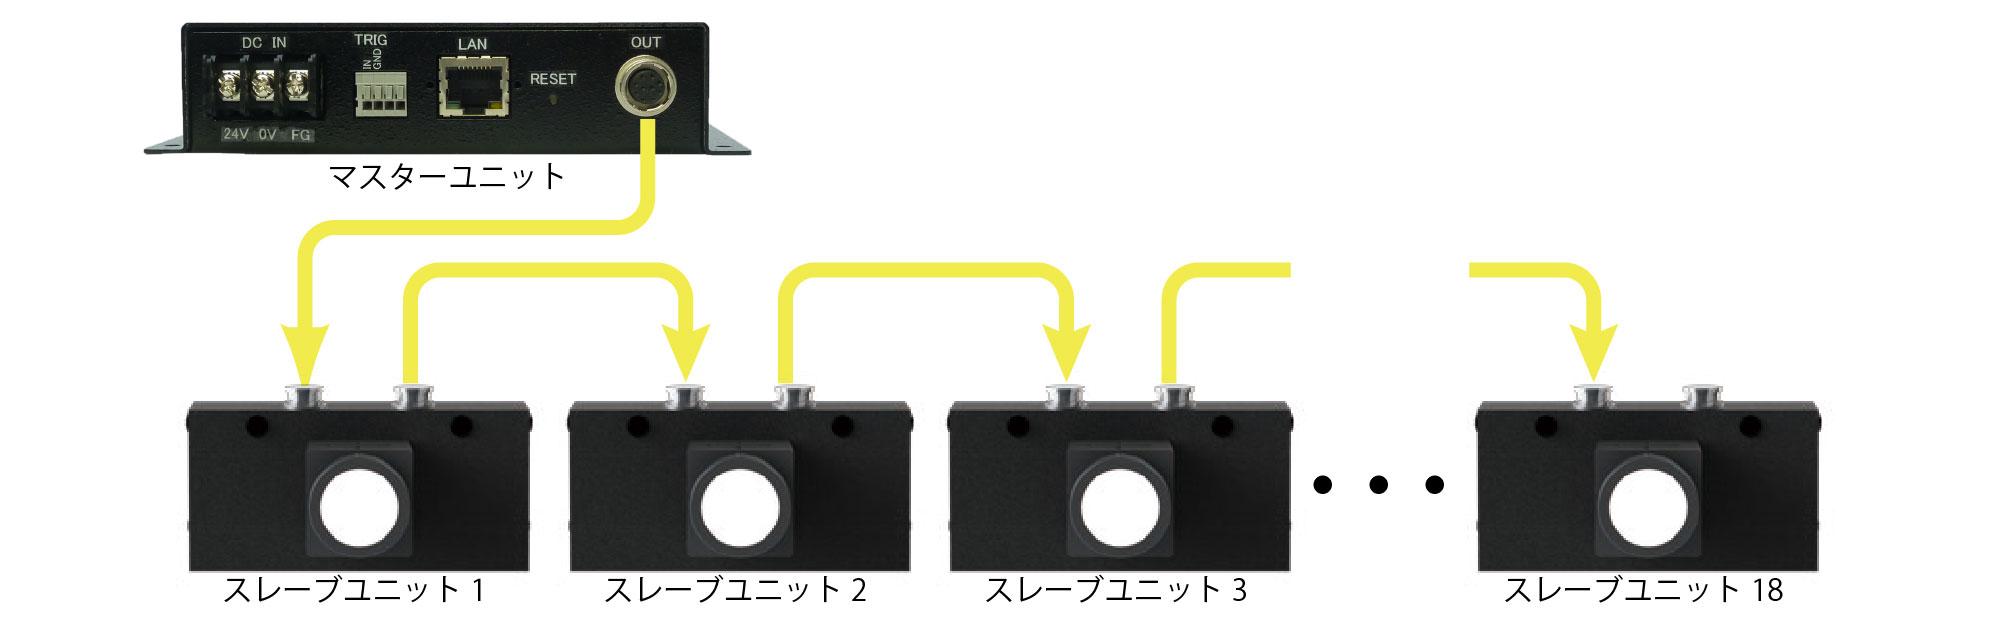 ISU-NS Product Description 02